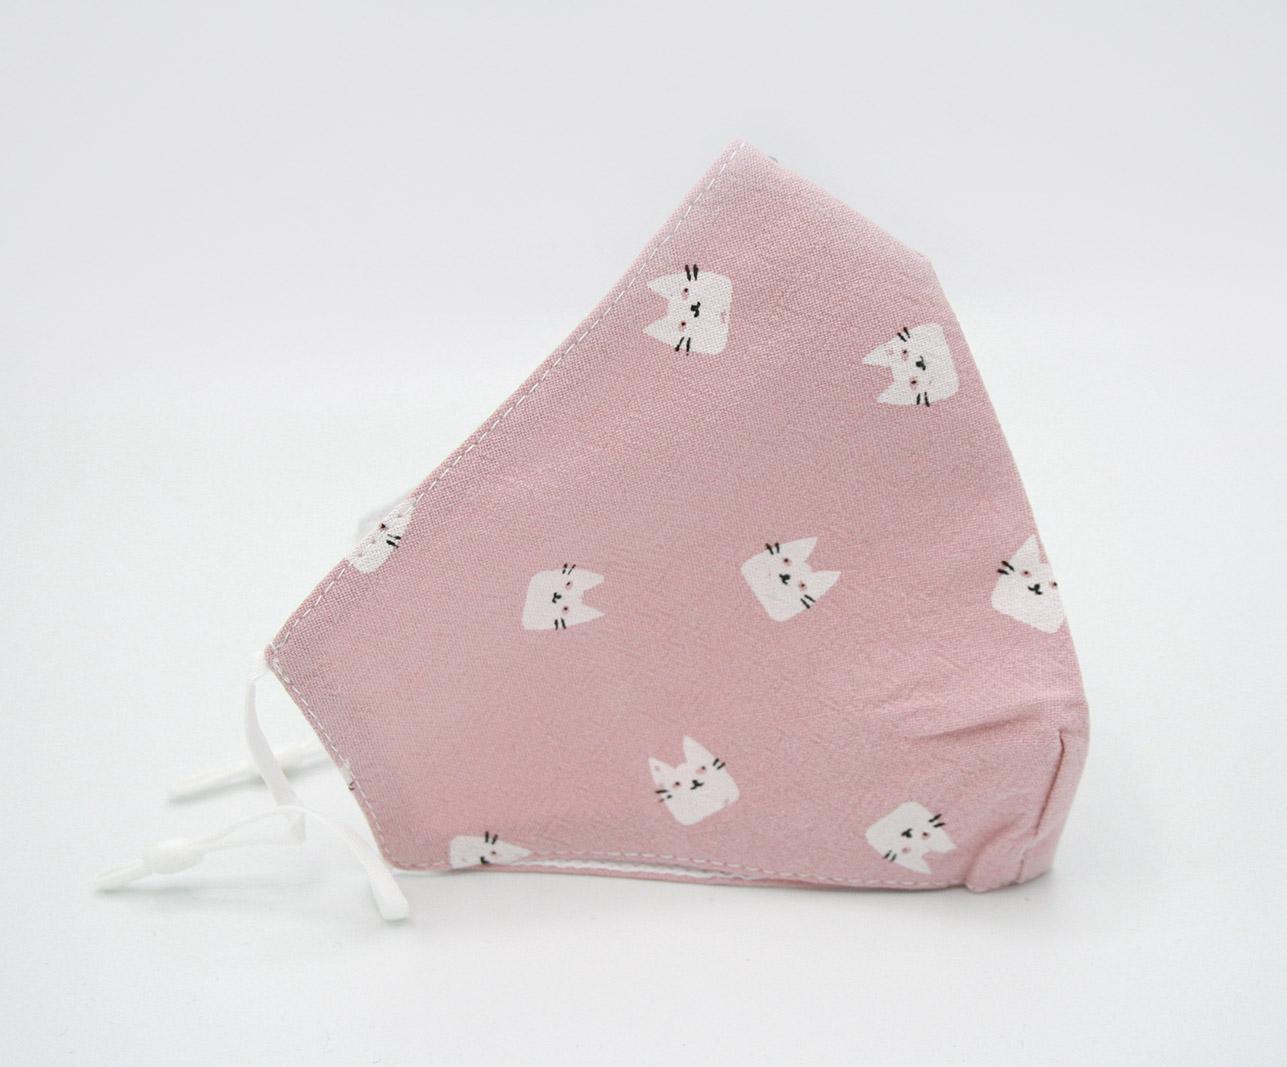 sepio mondmasker roze katoen poes opdruk (1)